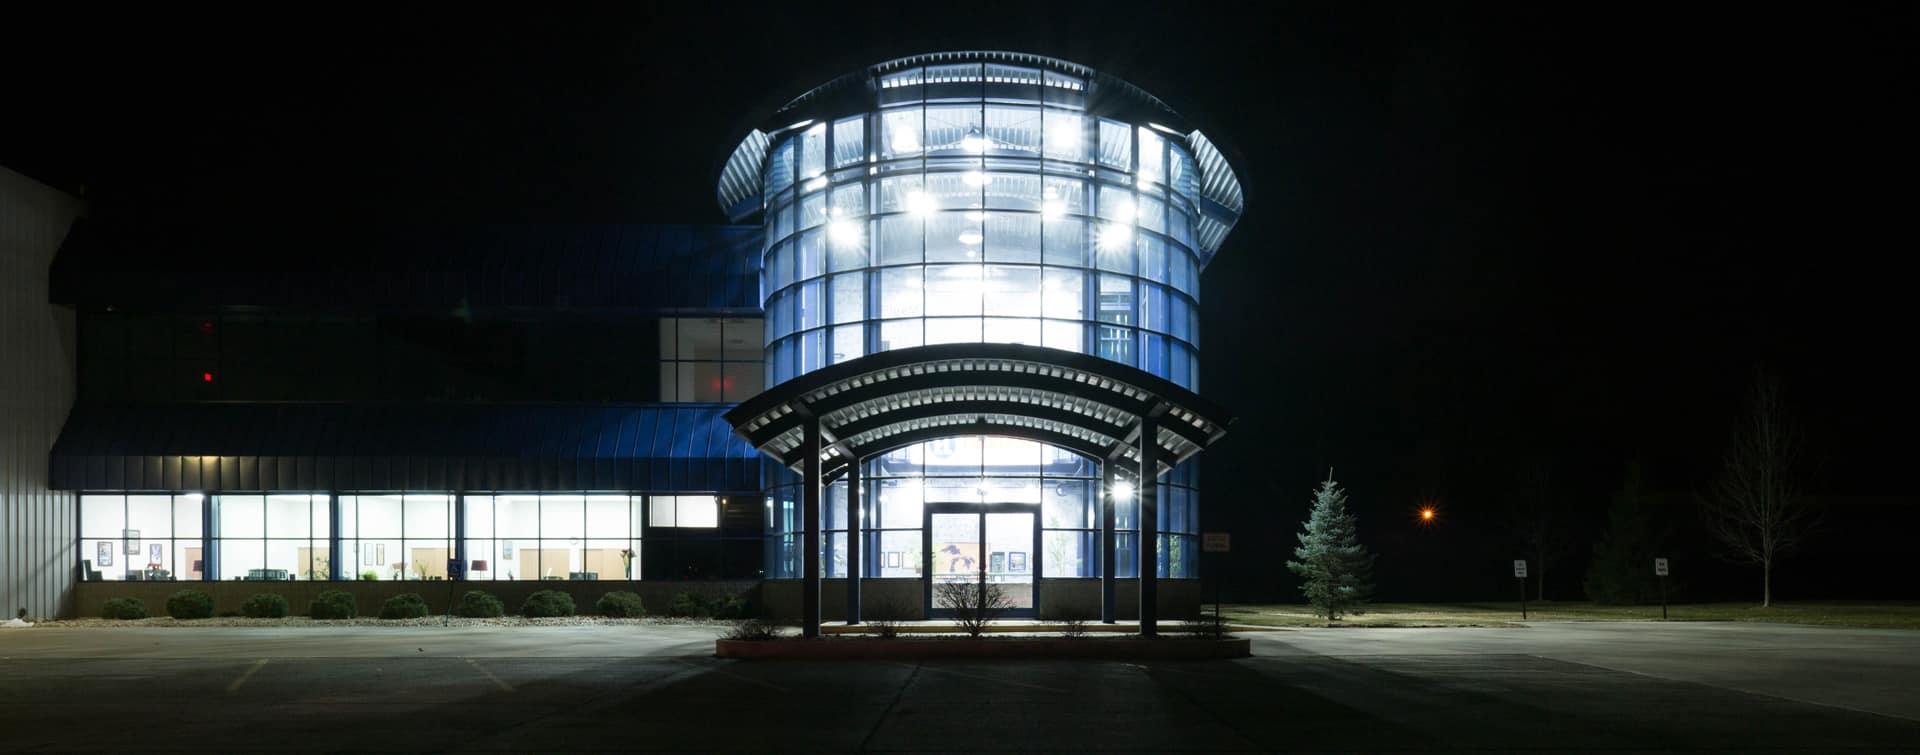 Buy michigan everlast lighting